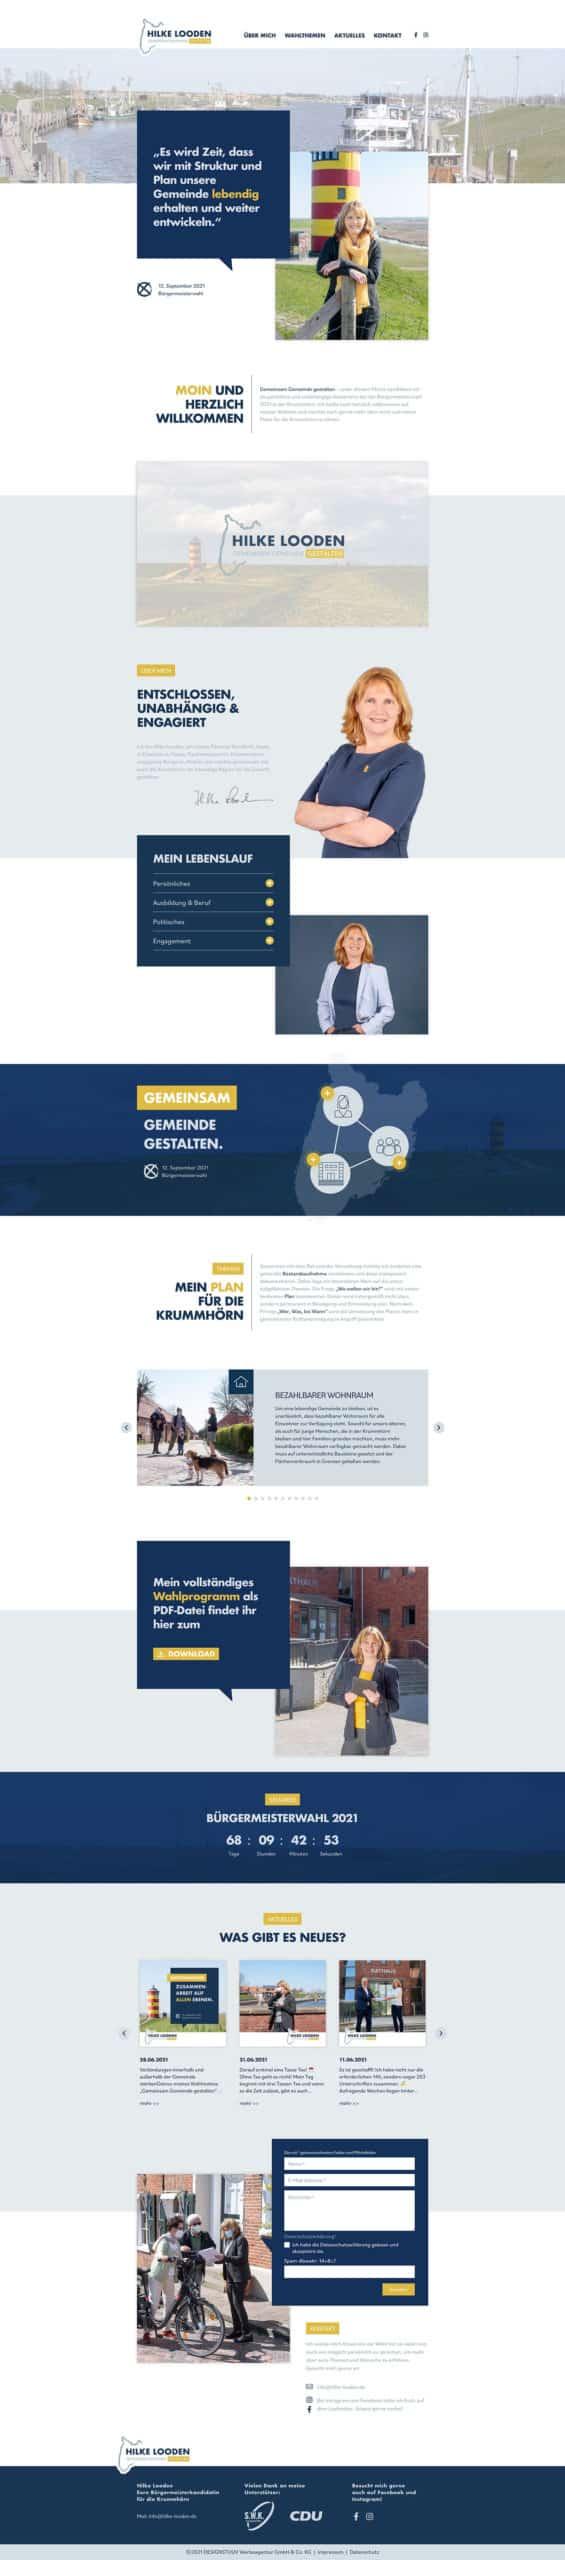 Designstuuv Referenzen Hilke Looden Website Desktop